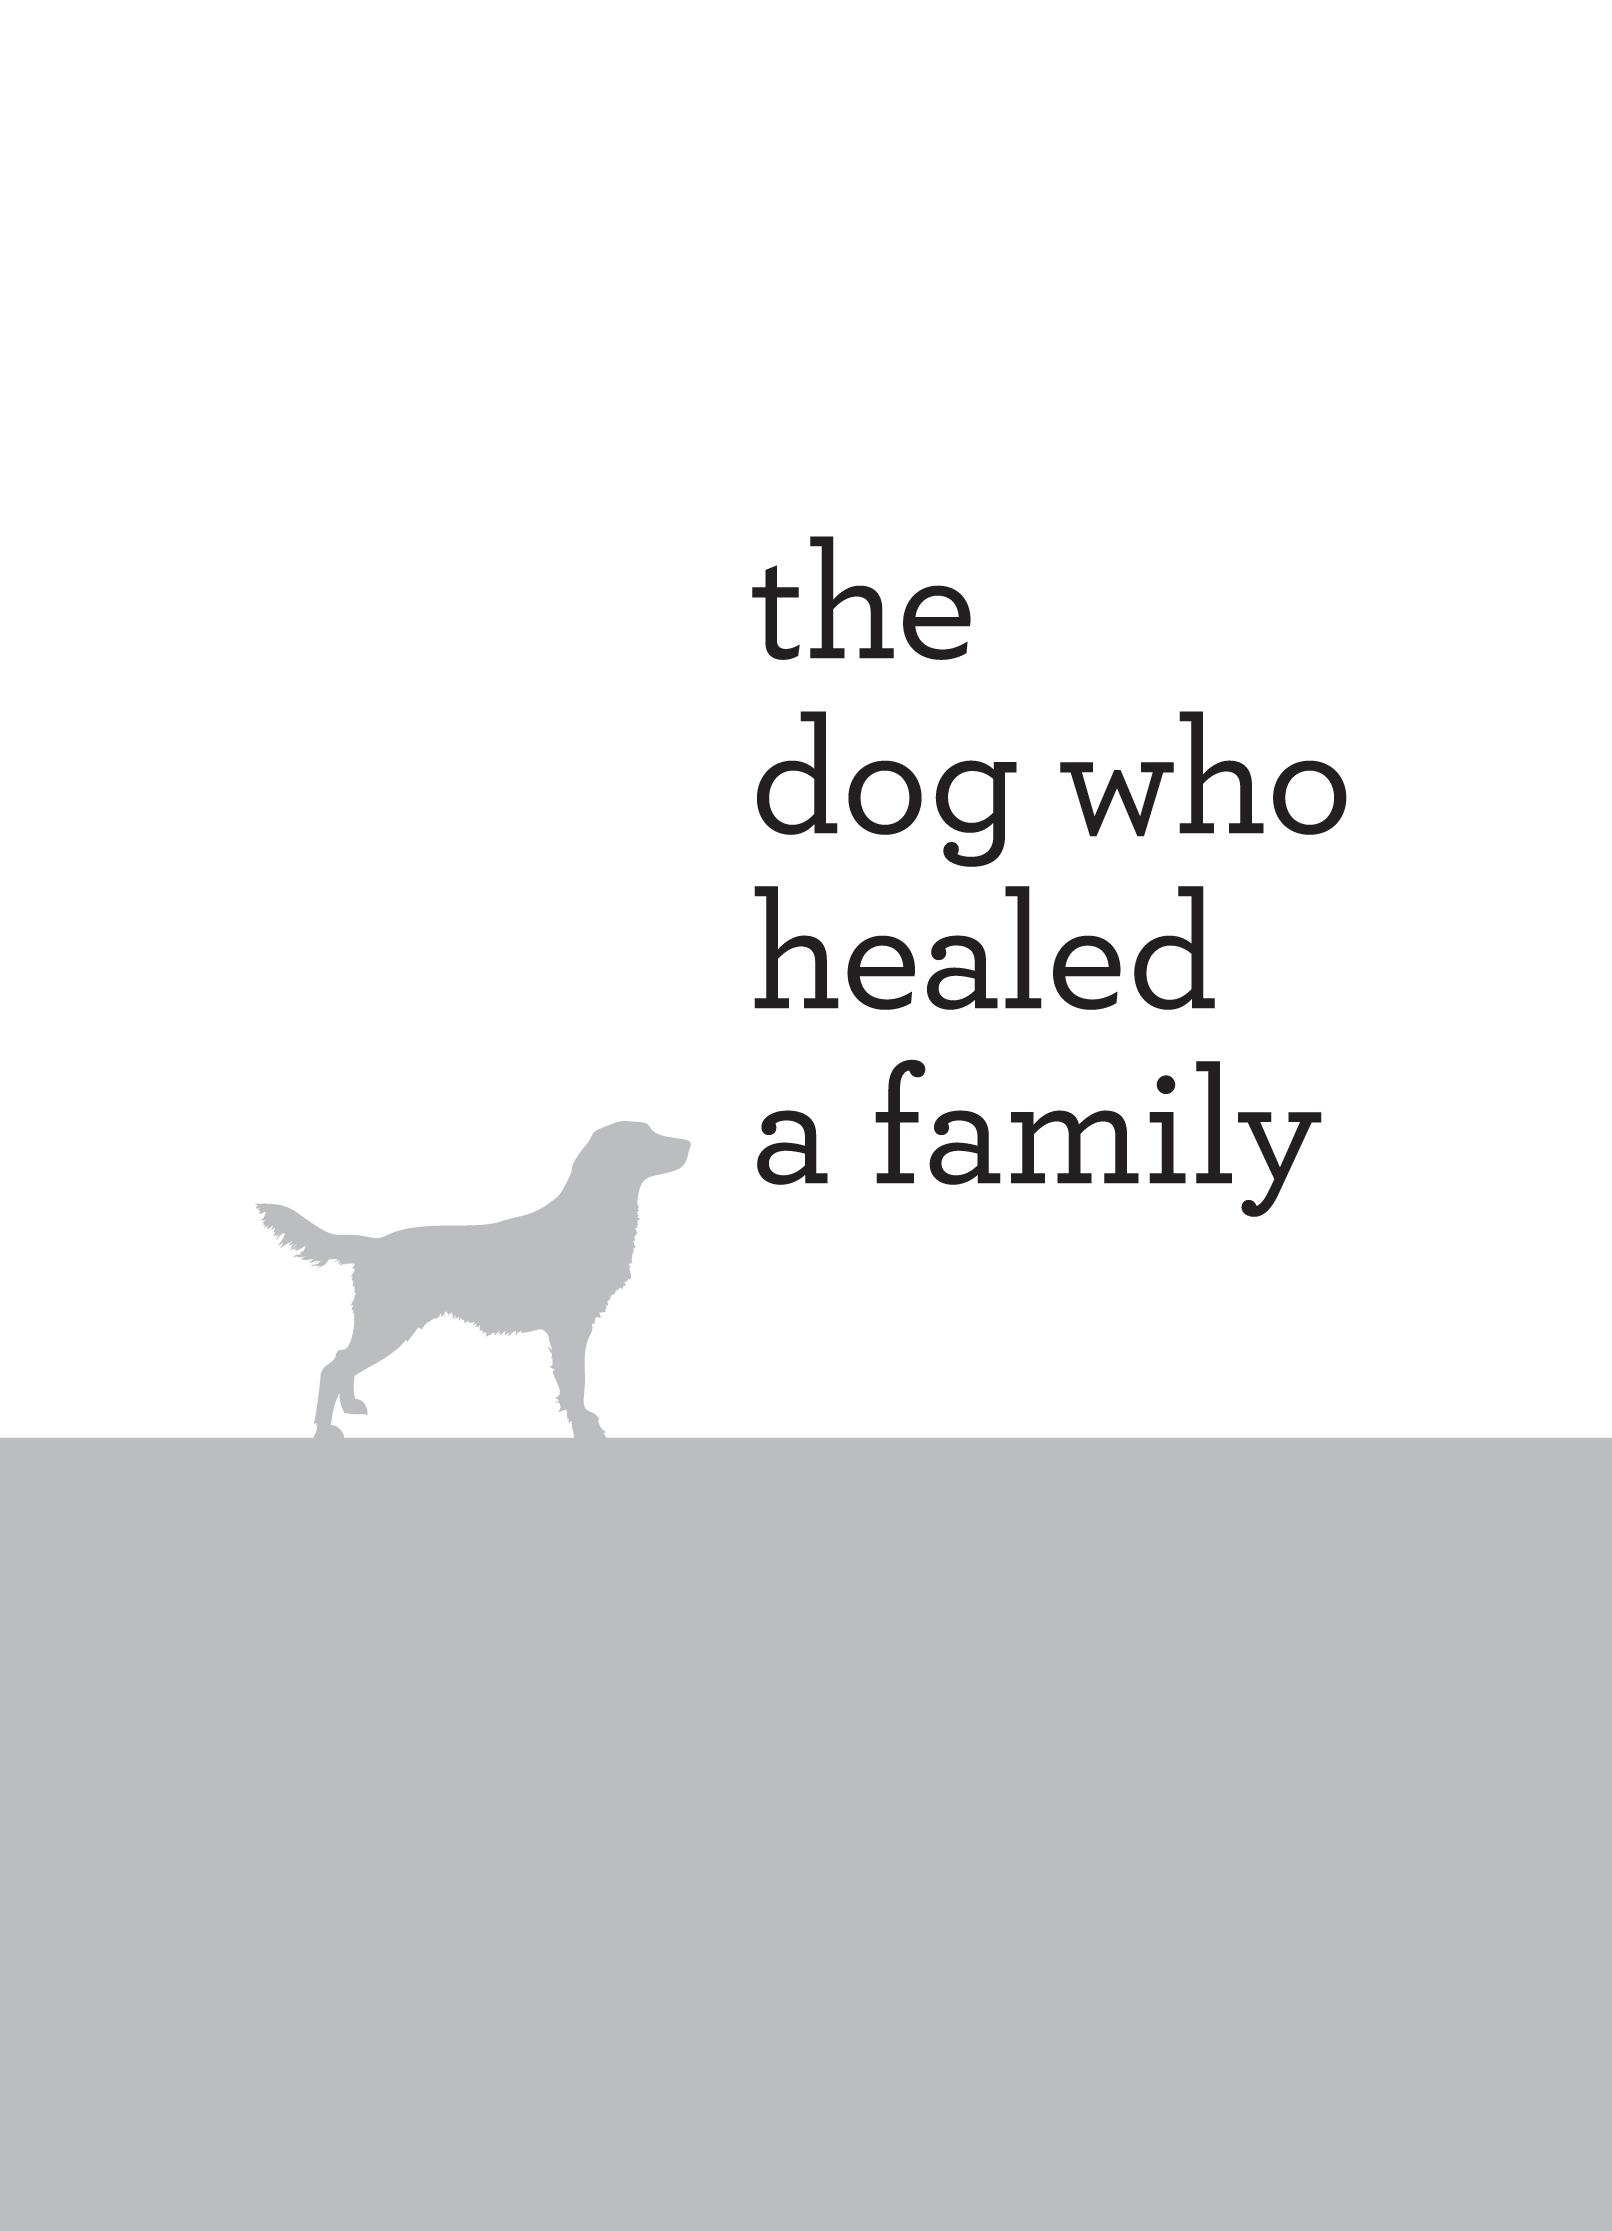 dogfamily.jpg